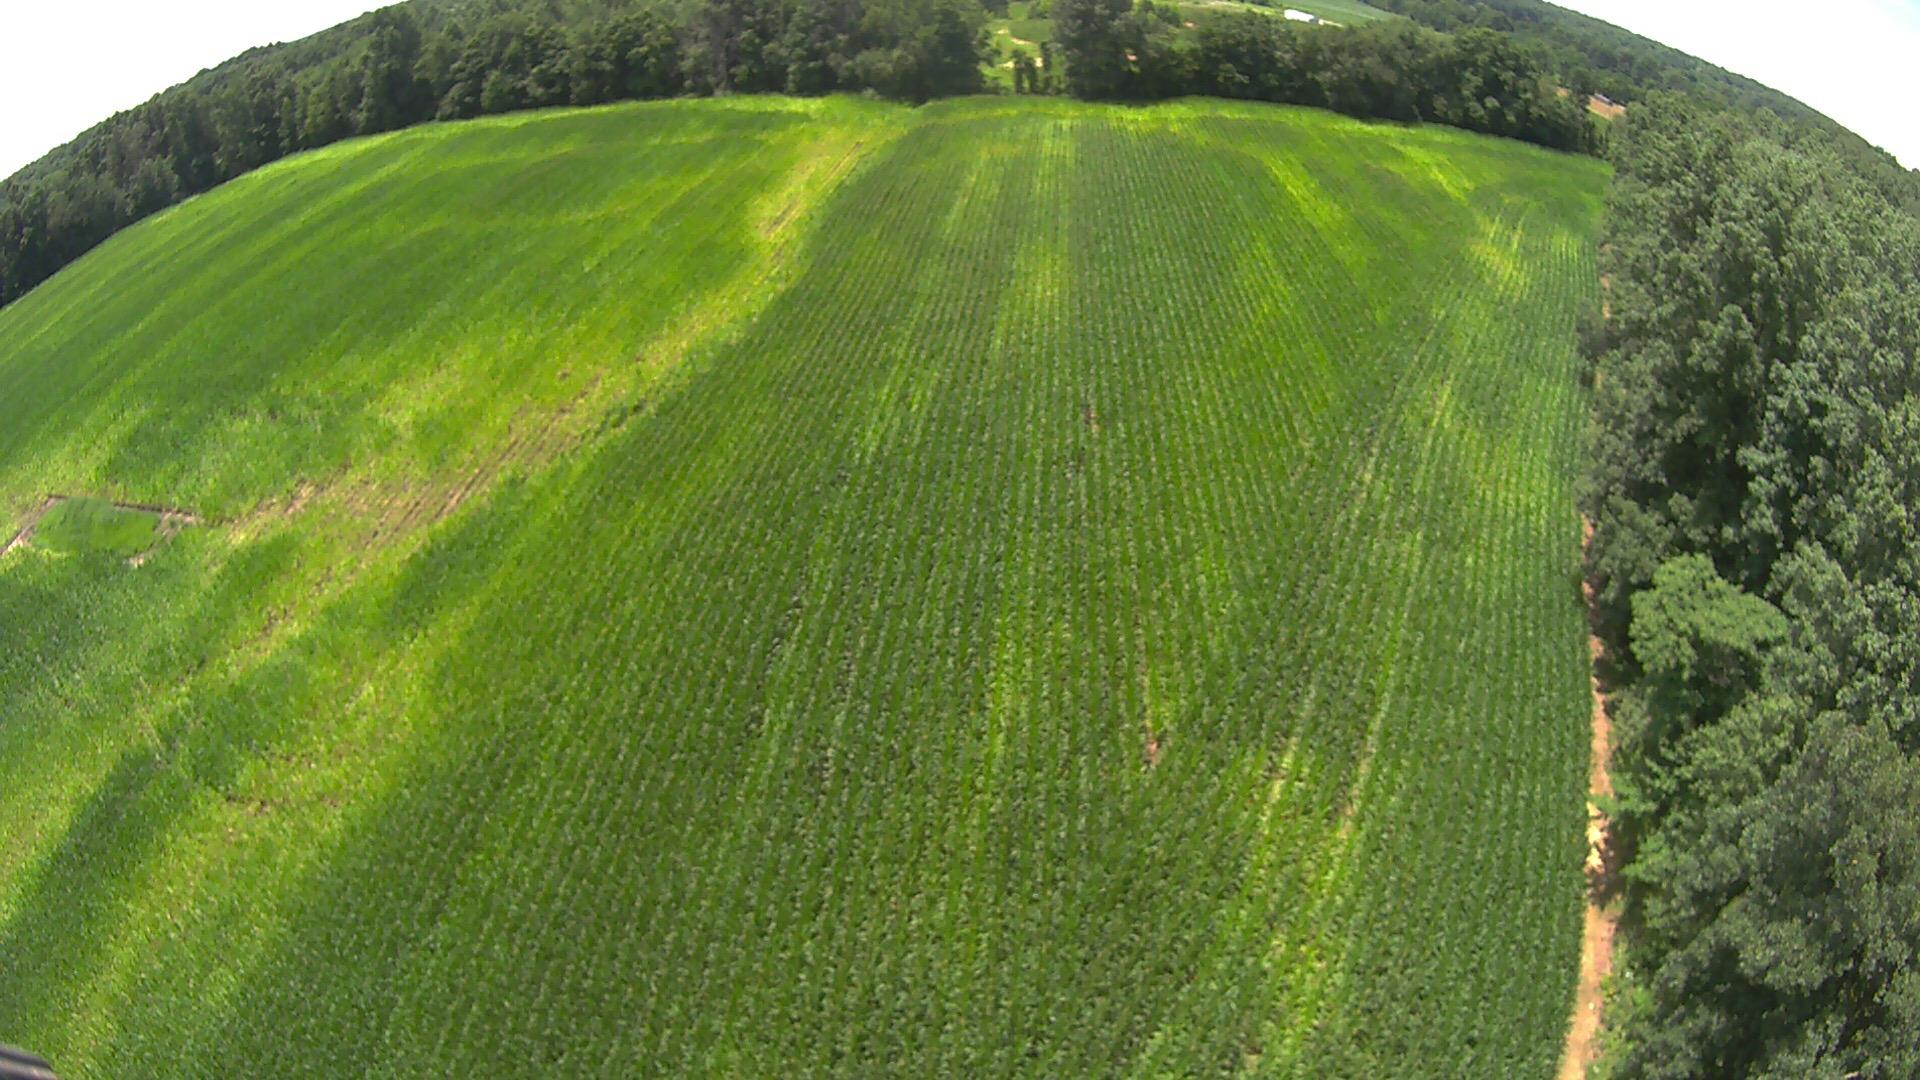 drone picture of crop in season.JPG